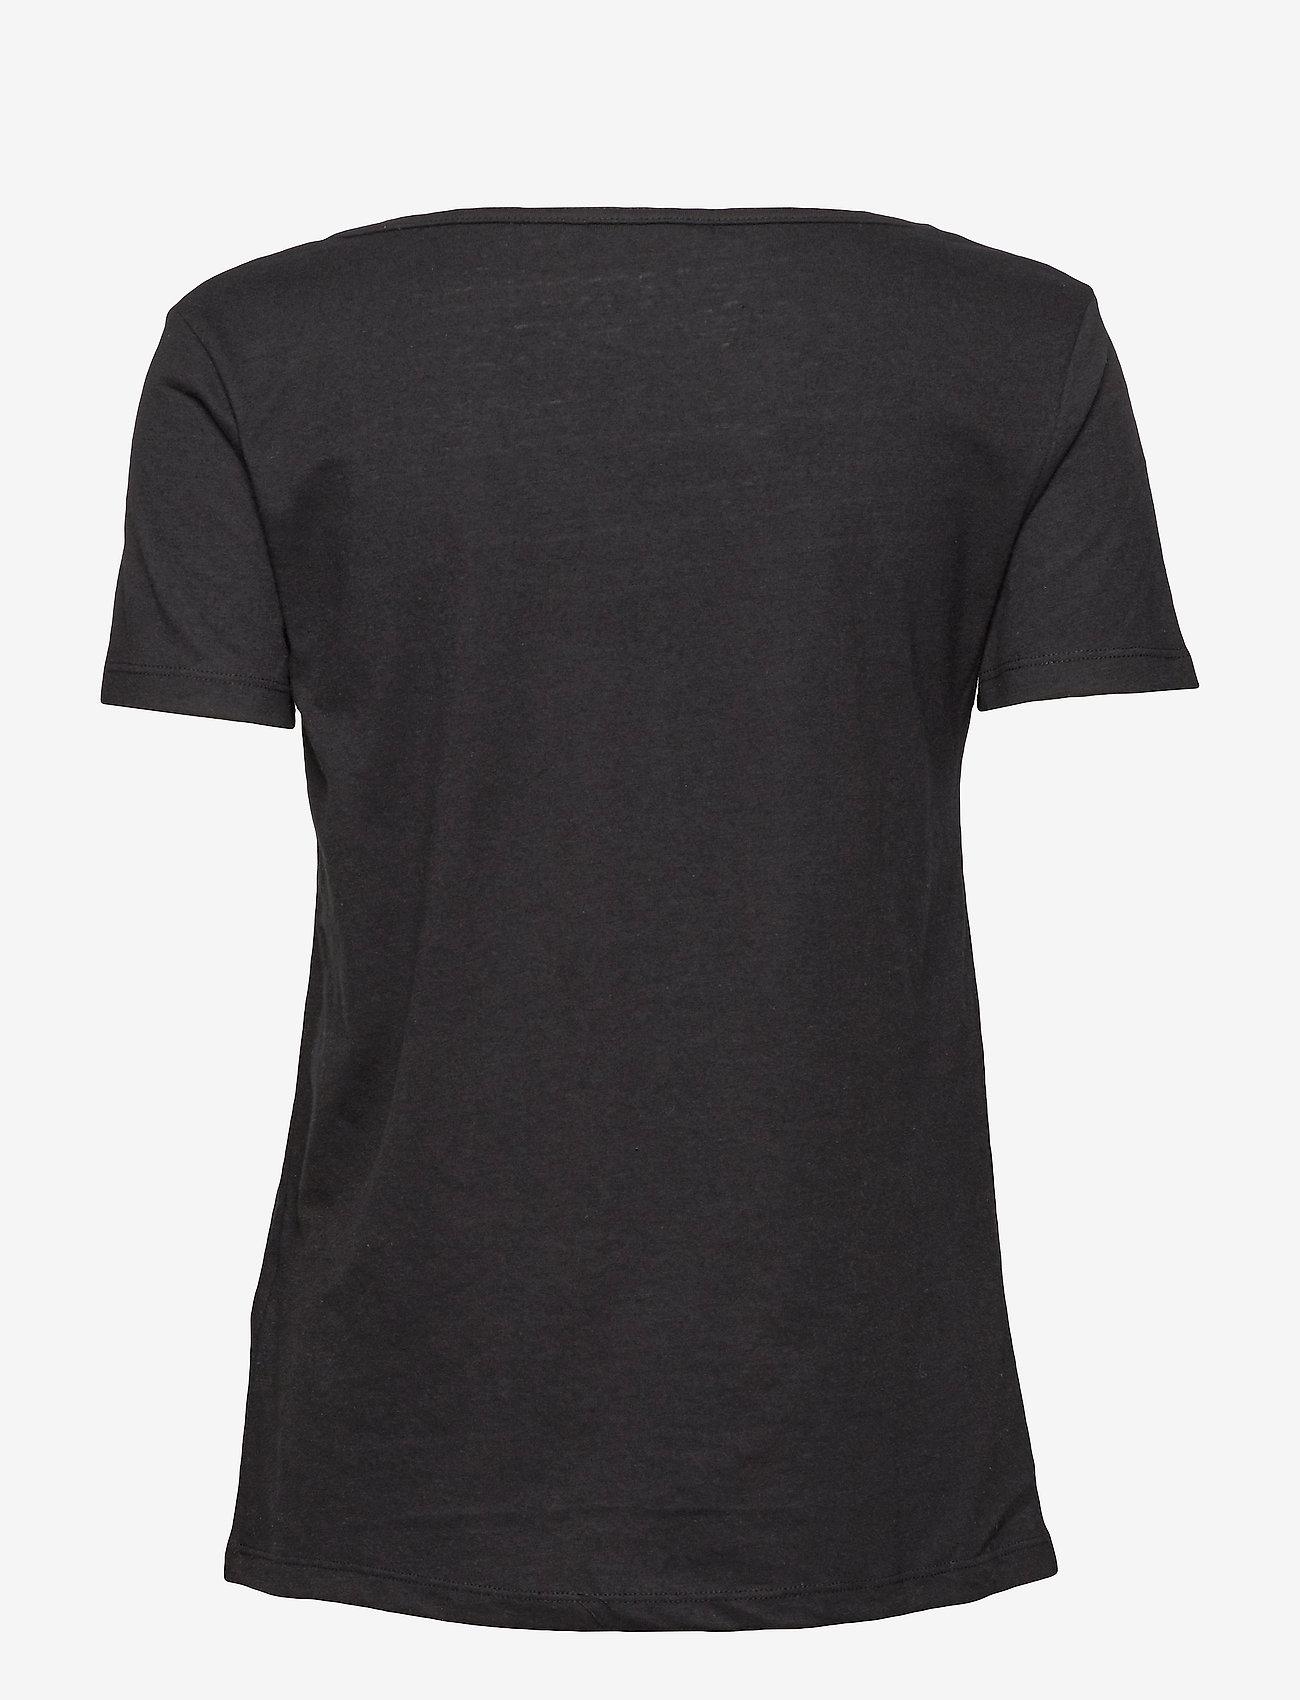 Samsøe Samsøe - Nobel tee 3170 - basic t-shirts - black - 1